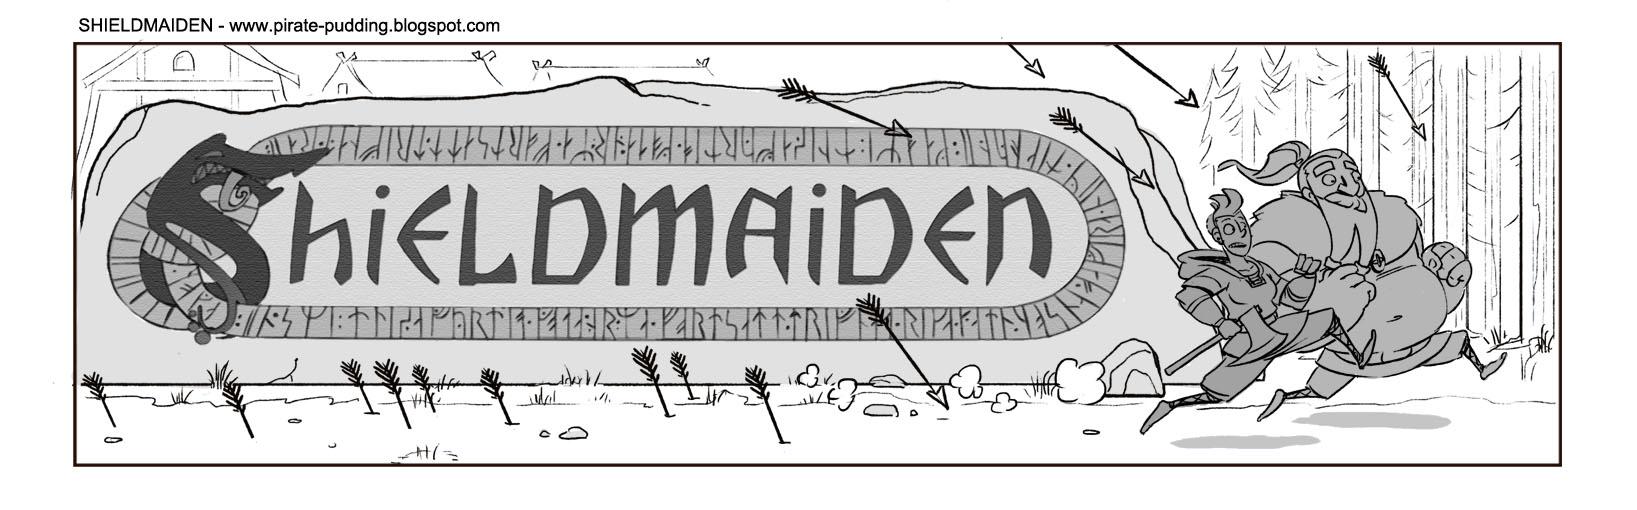 Shieldmaiden comic 003